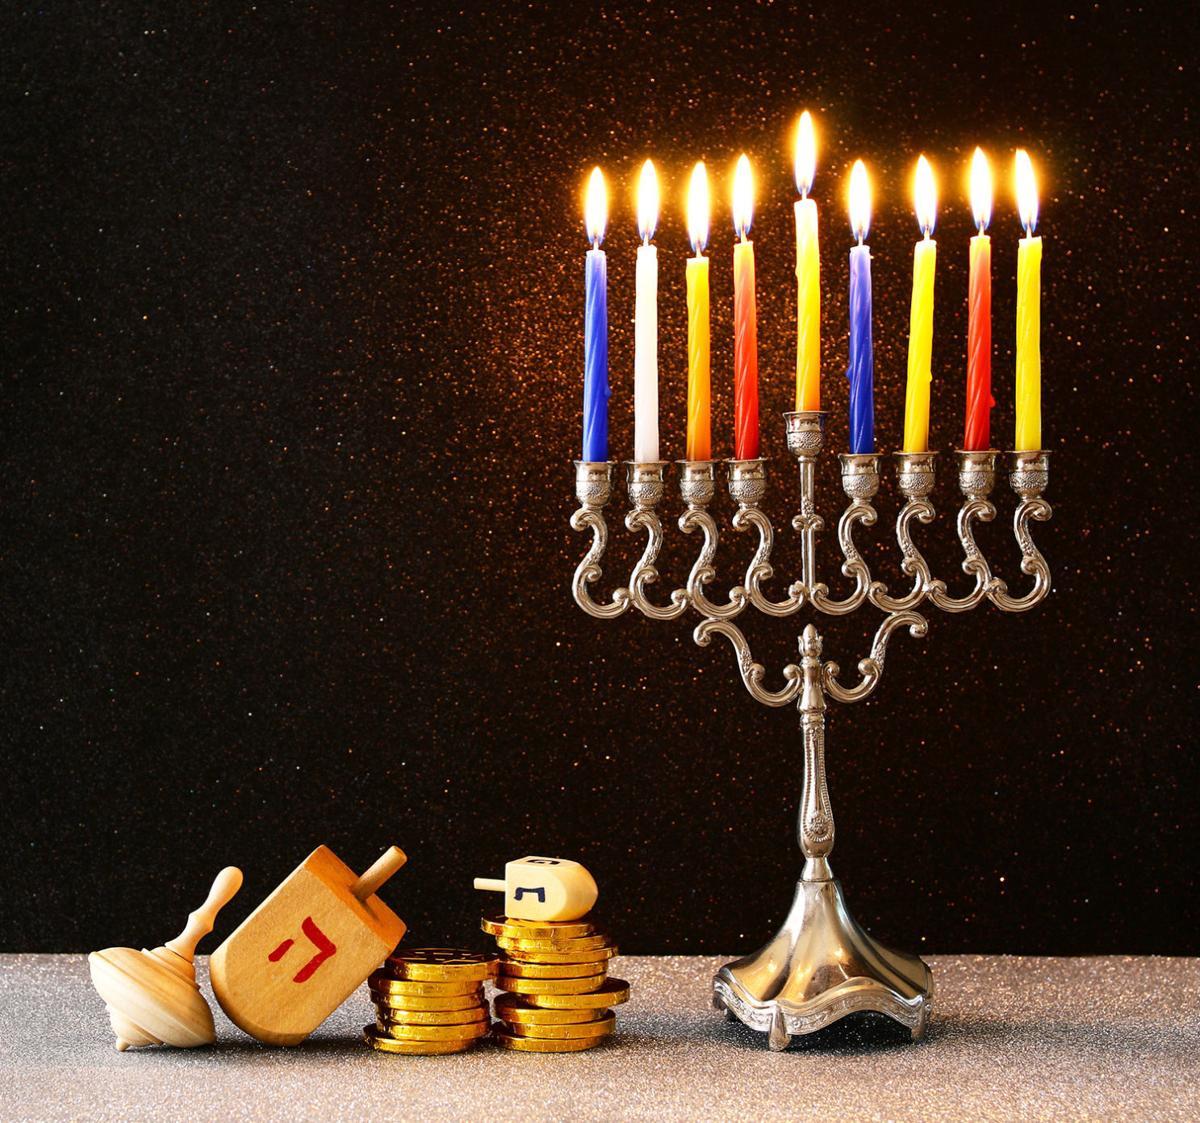 Bernard Mendelman: The Jewish holiday that everyone spells differently